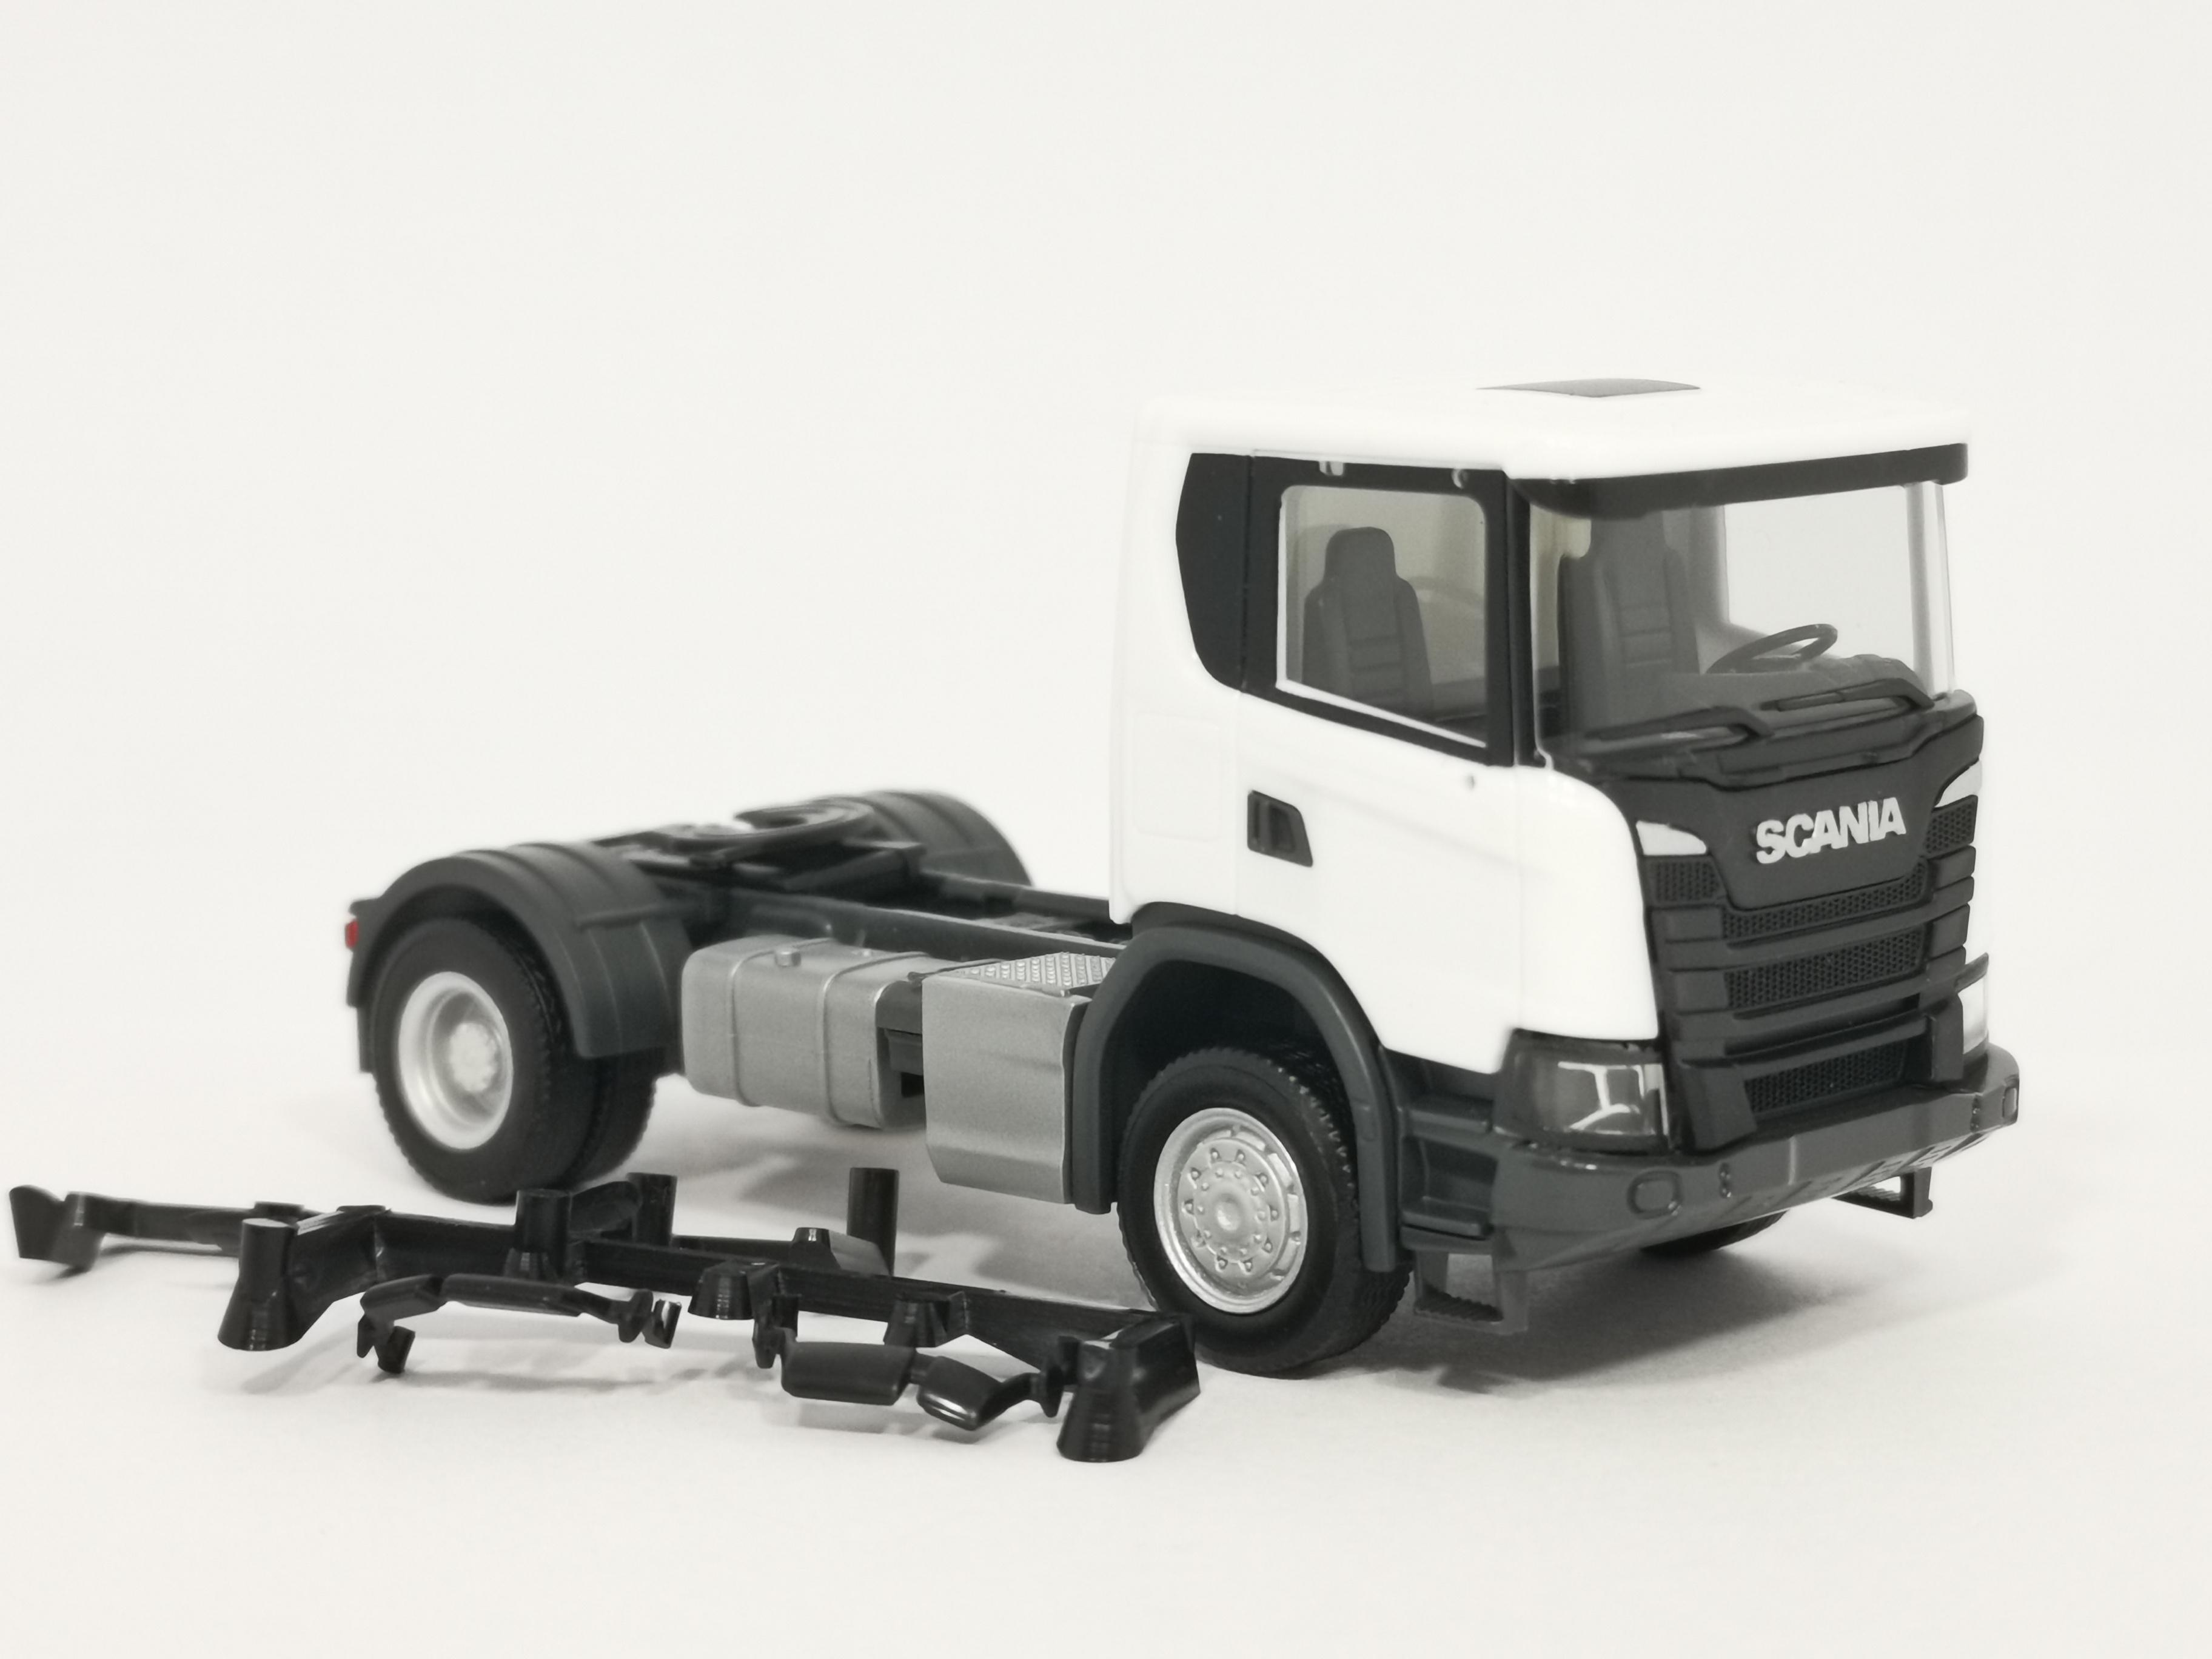 herpa 309769 Scania CG 17 4x4 Zugmaschine OVP weiß 1:87 NEU